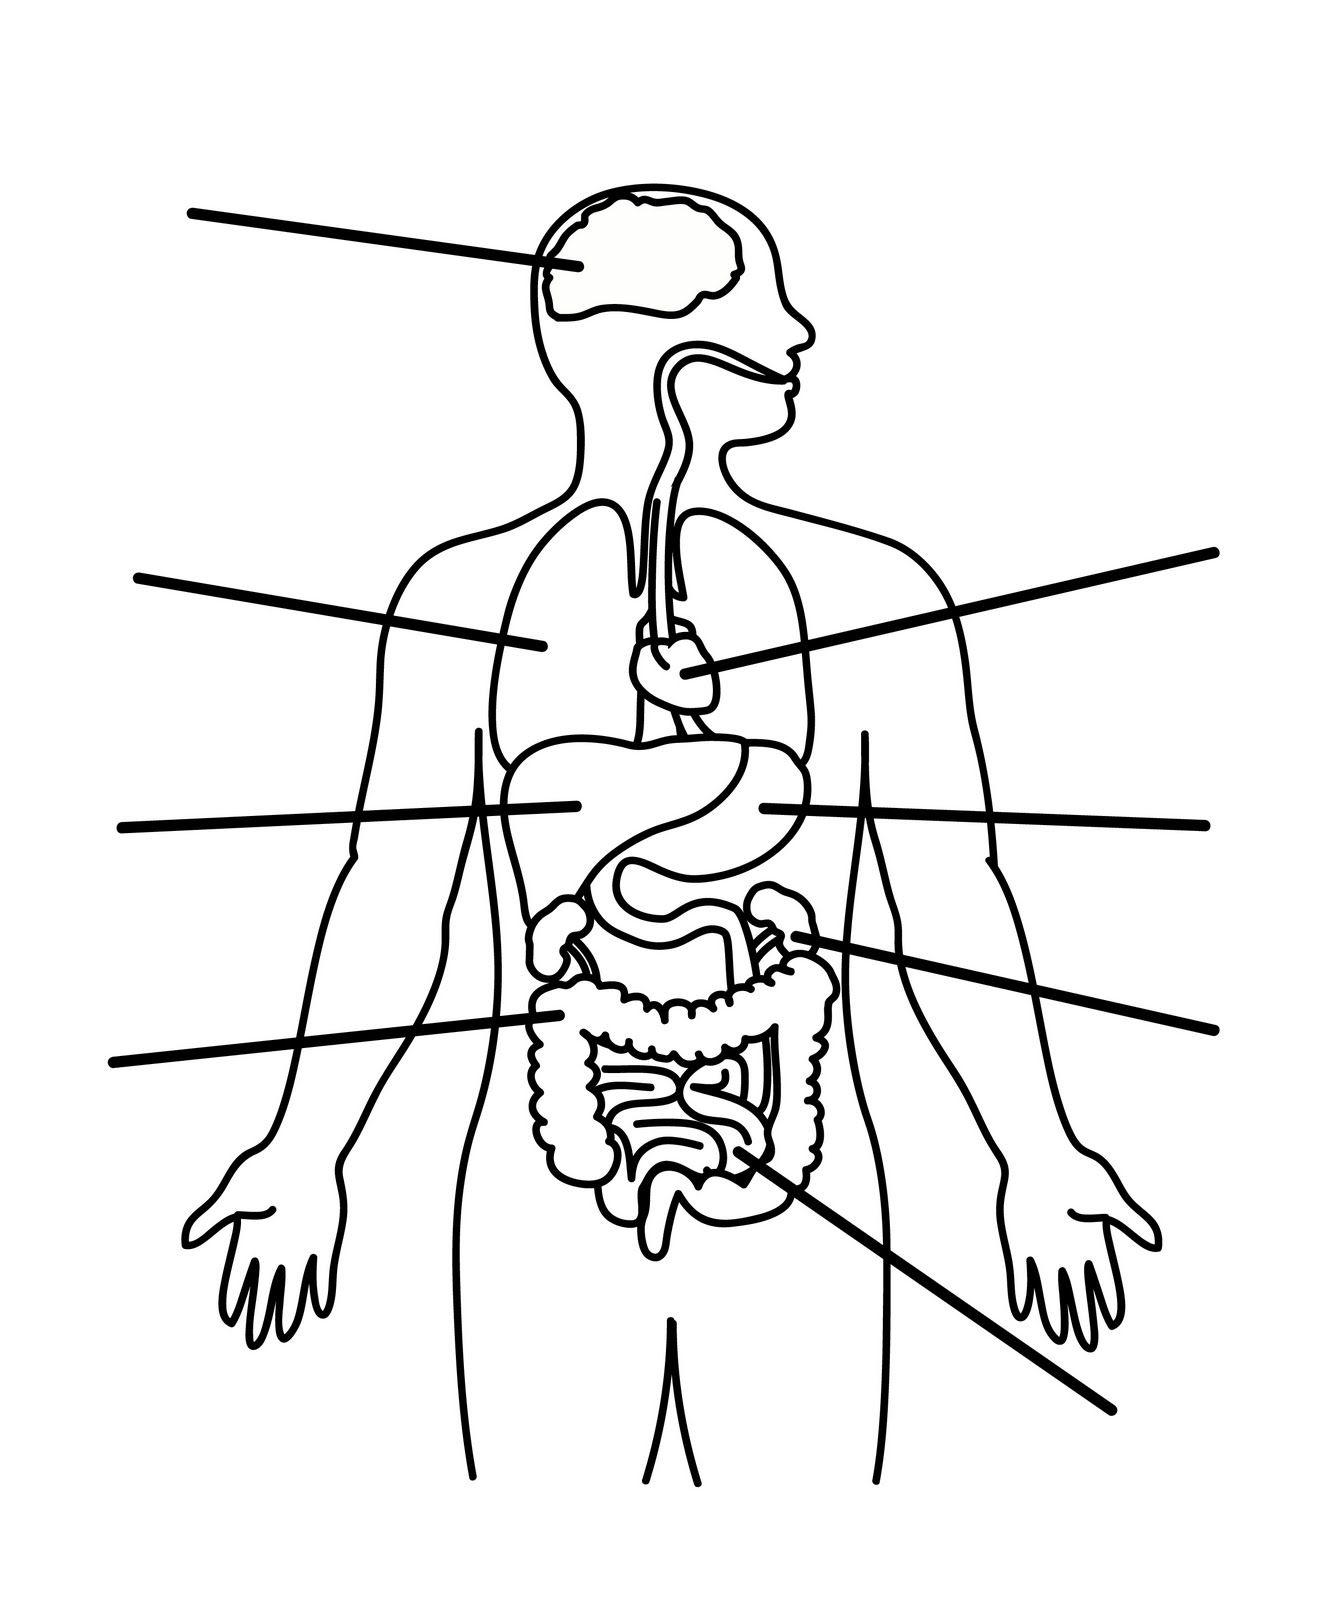 1333x1600 Drawing The Human Body Coloring Grade Printable